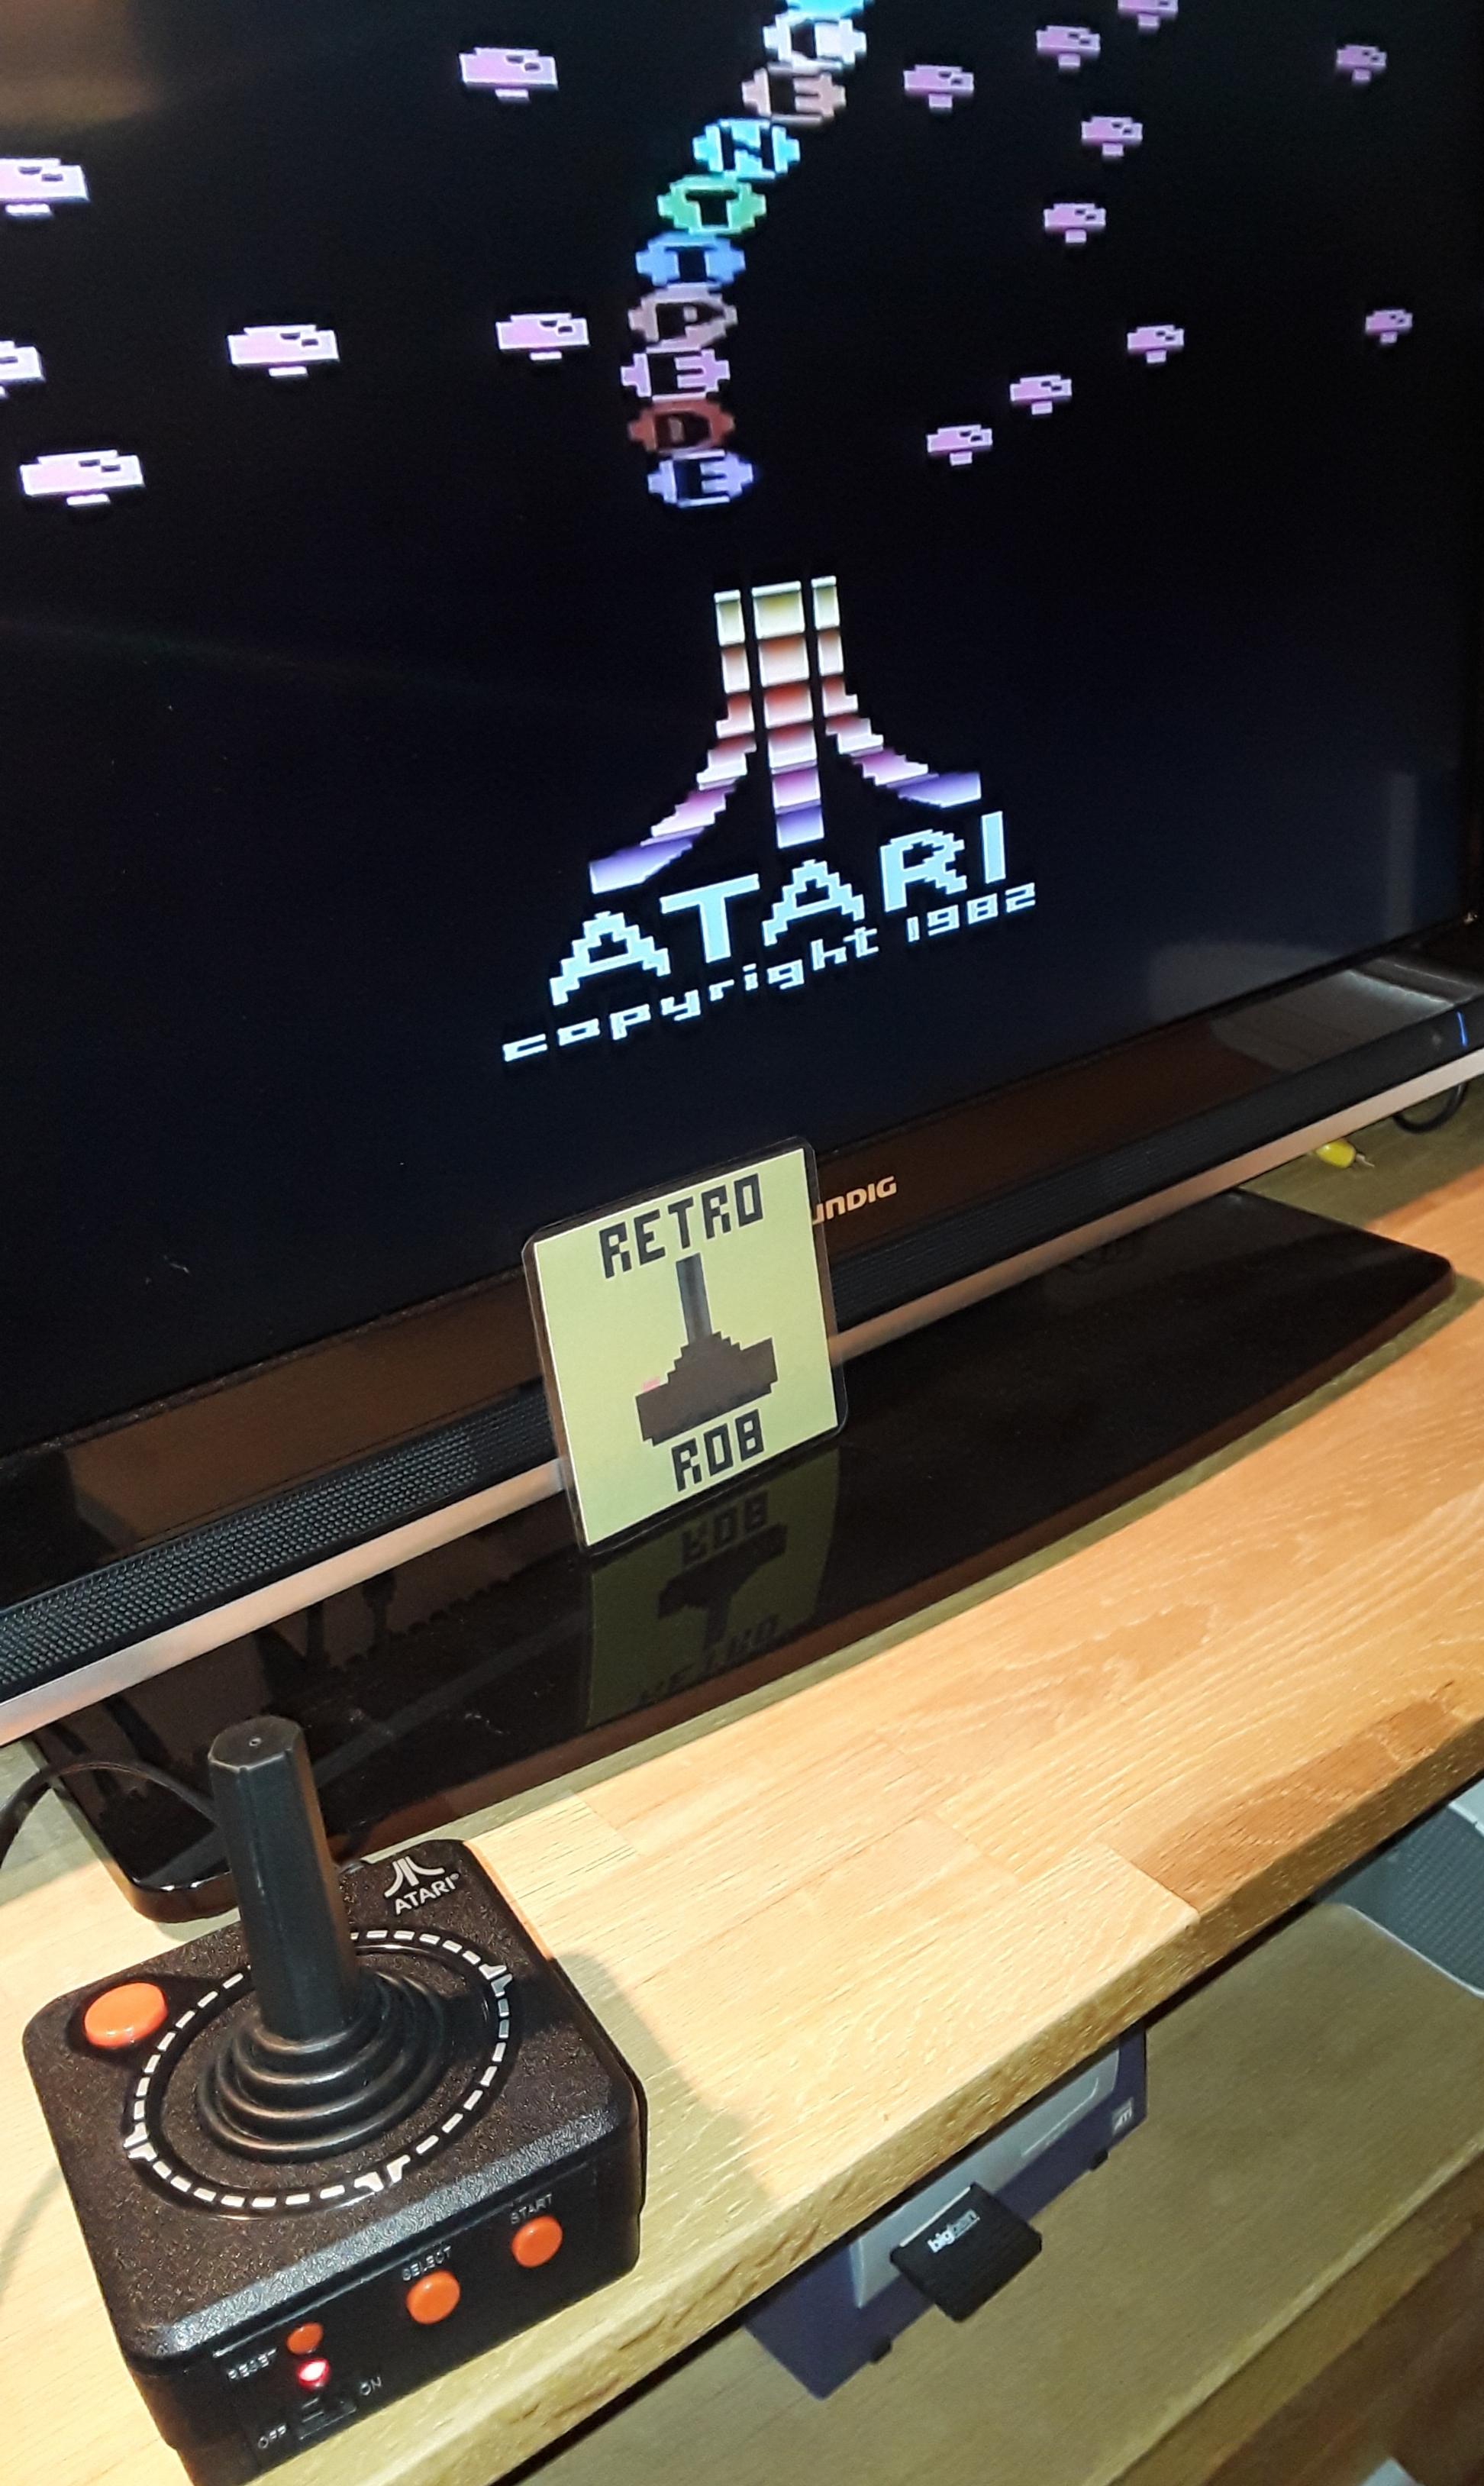 RetroRob: Centipede (Jakks Pacific Atari TV Joystick) 27,433 points on 2018-12-01 01:35:18